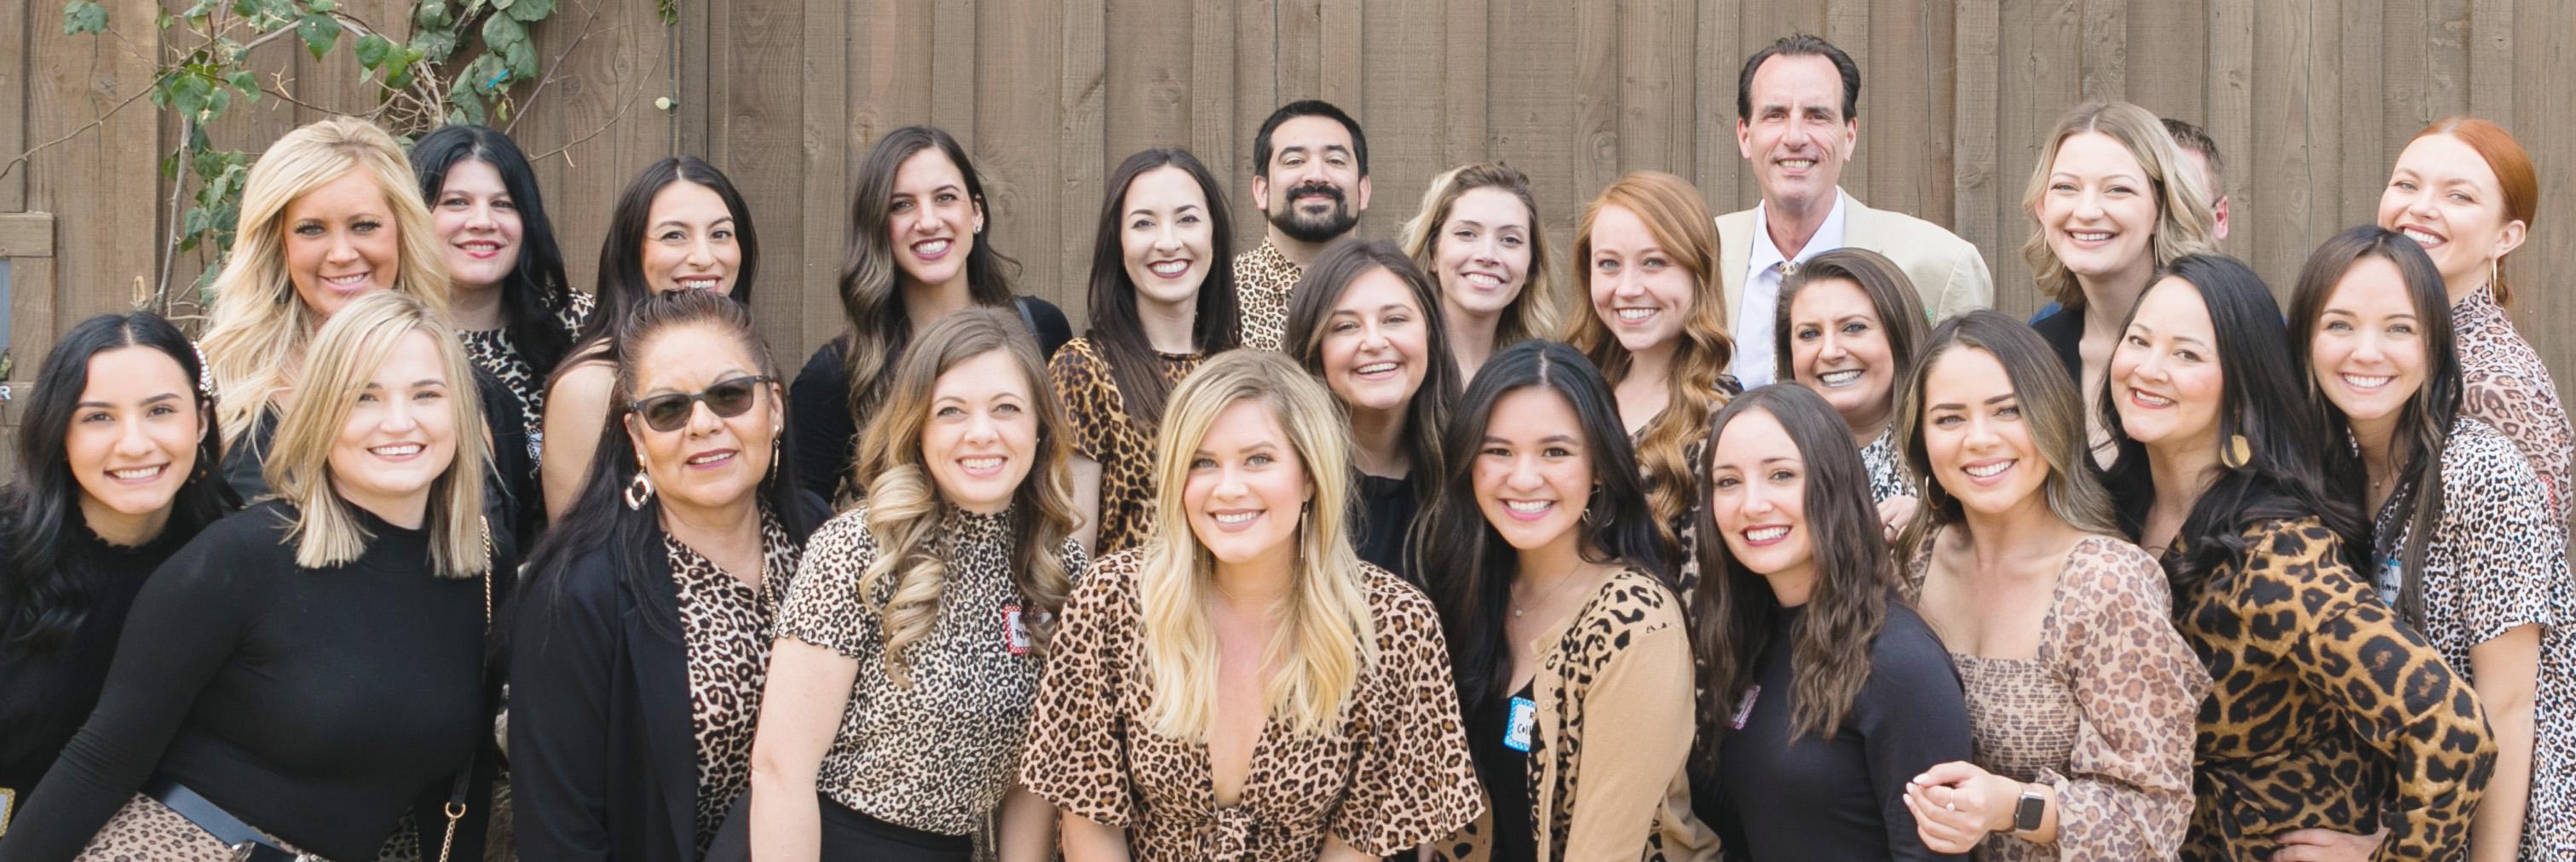 Frindly team of Wedding Experts in Arizona